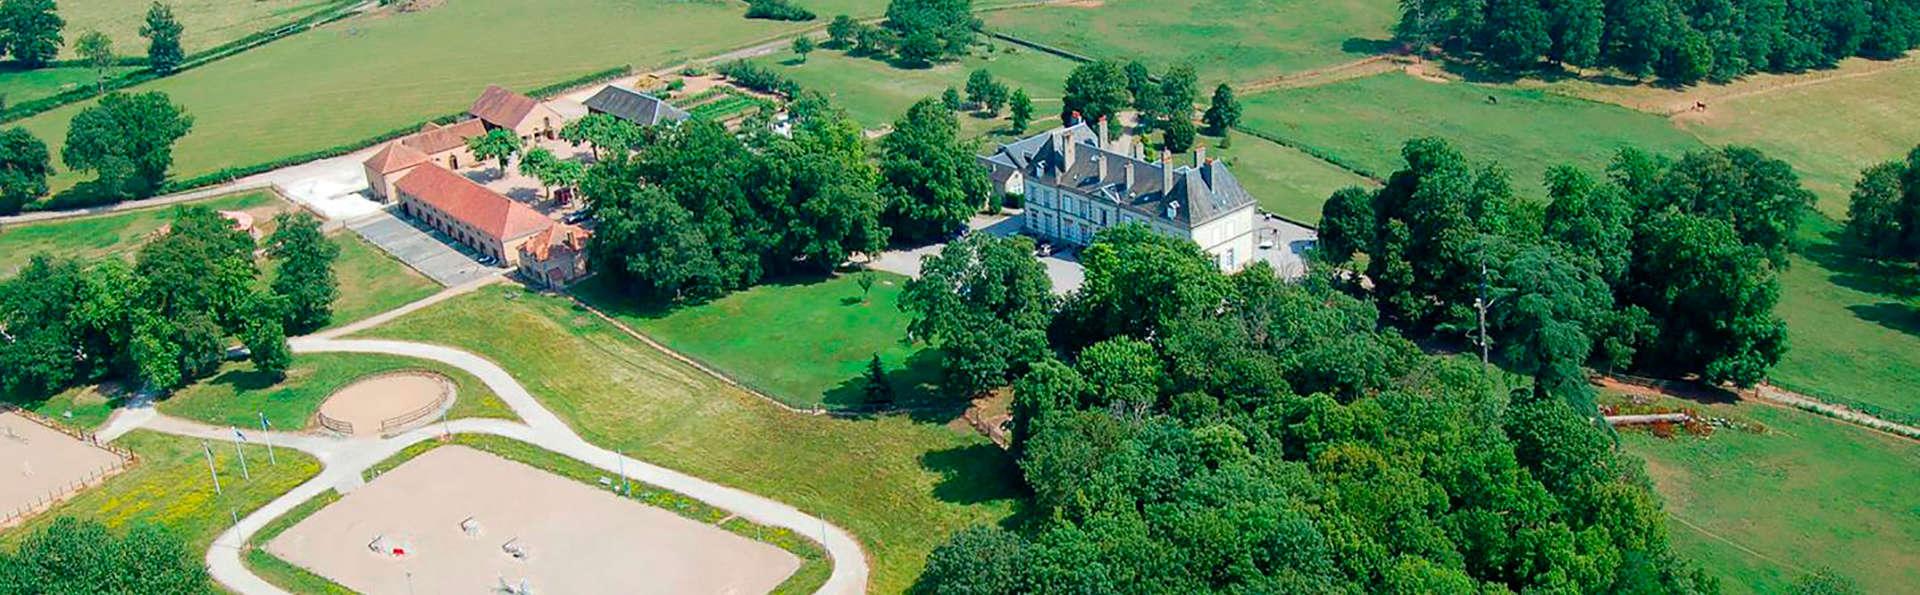 Château d'Ygrande  - EDIT_aerea.jpg